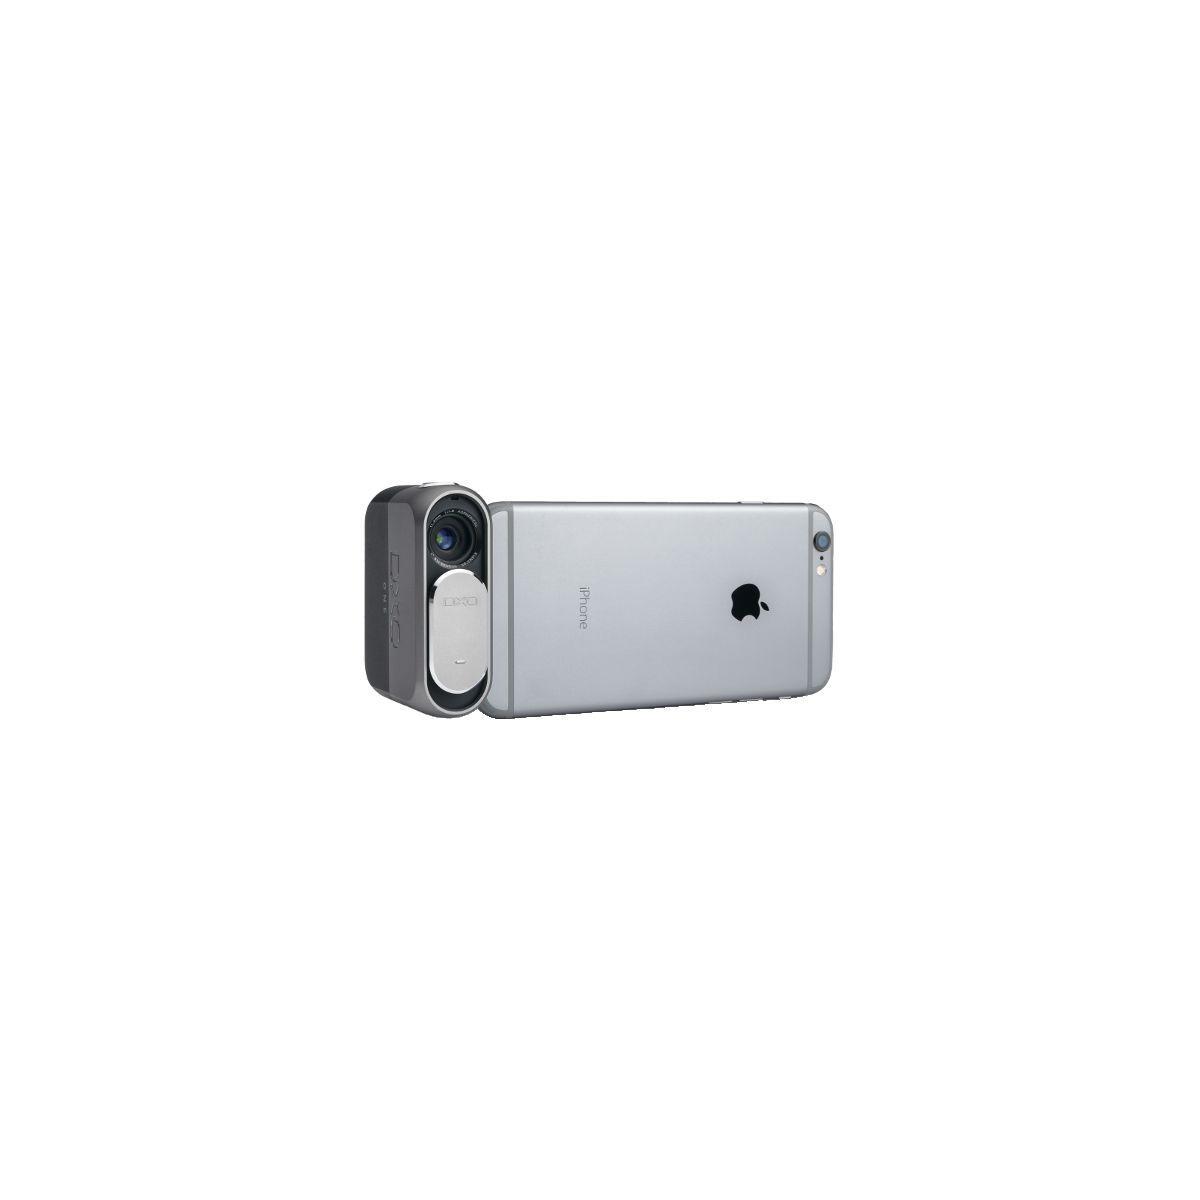 Appareil photo compact dxo dxo one camera fr - gris et noir (photo)